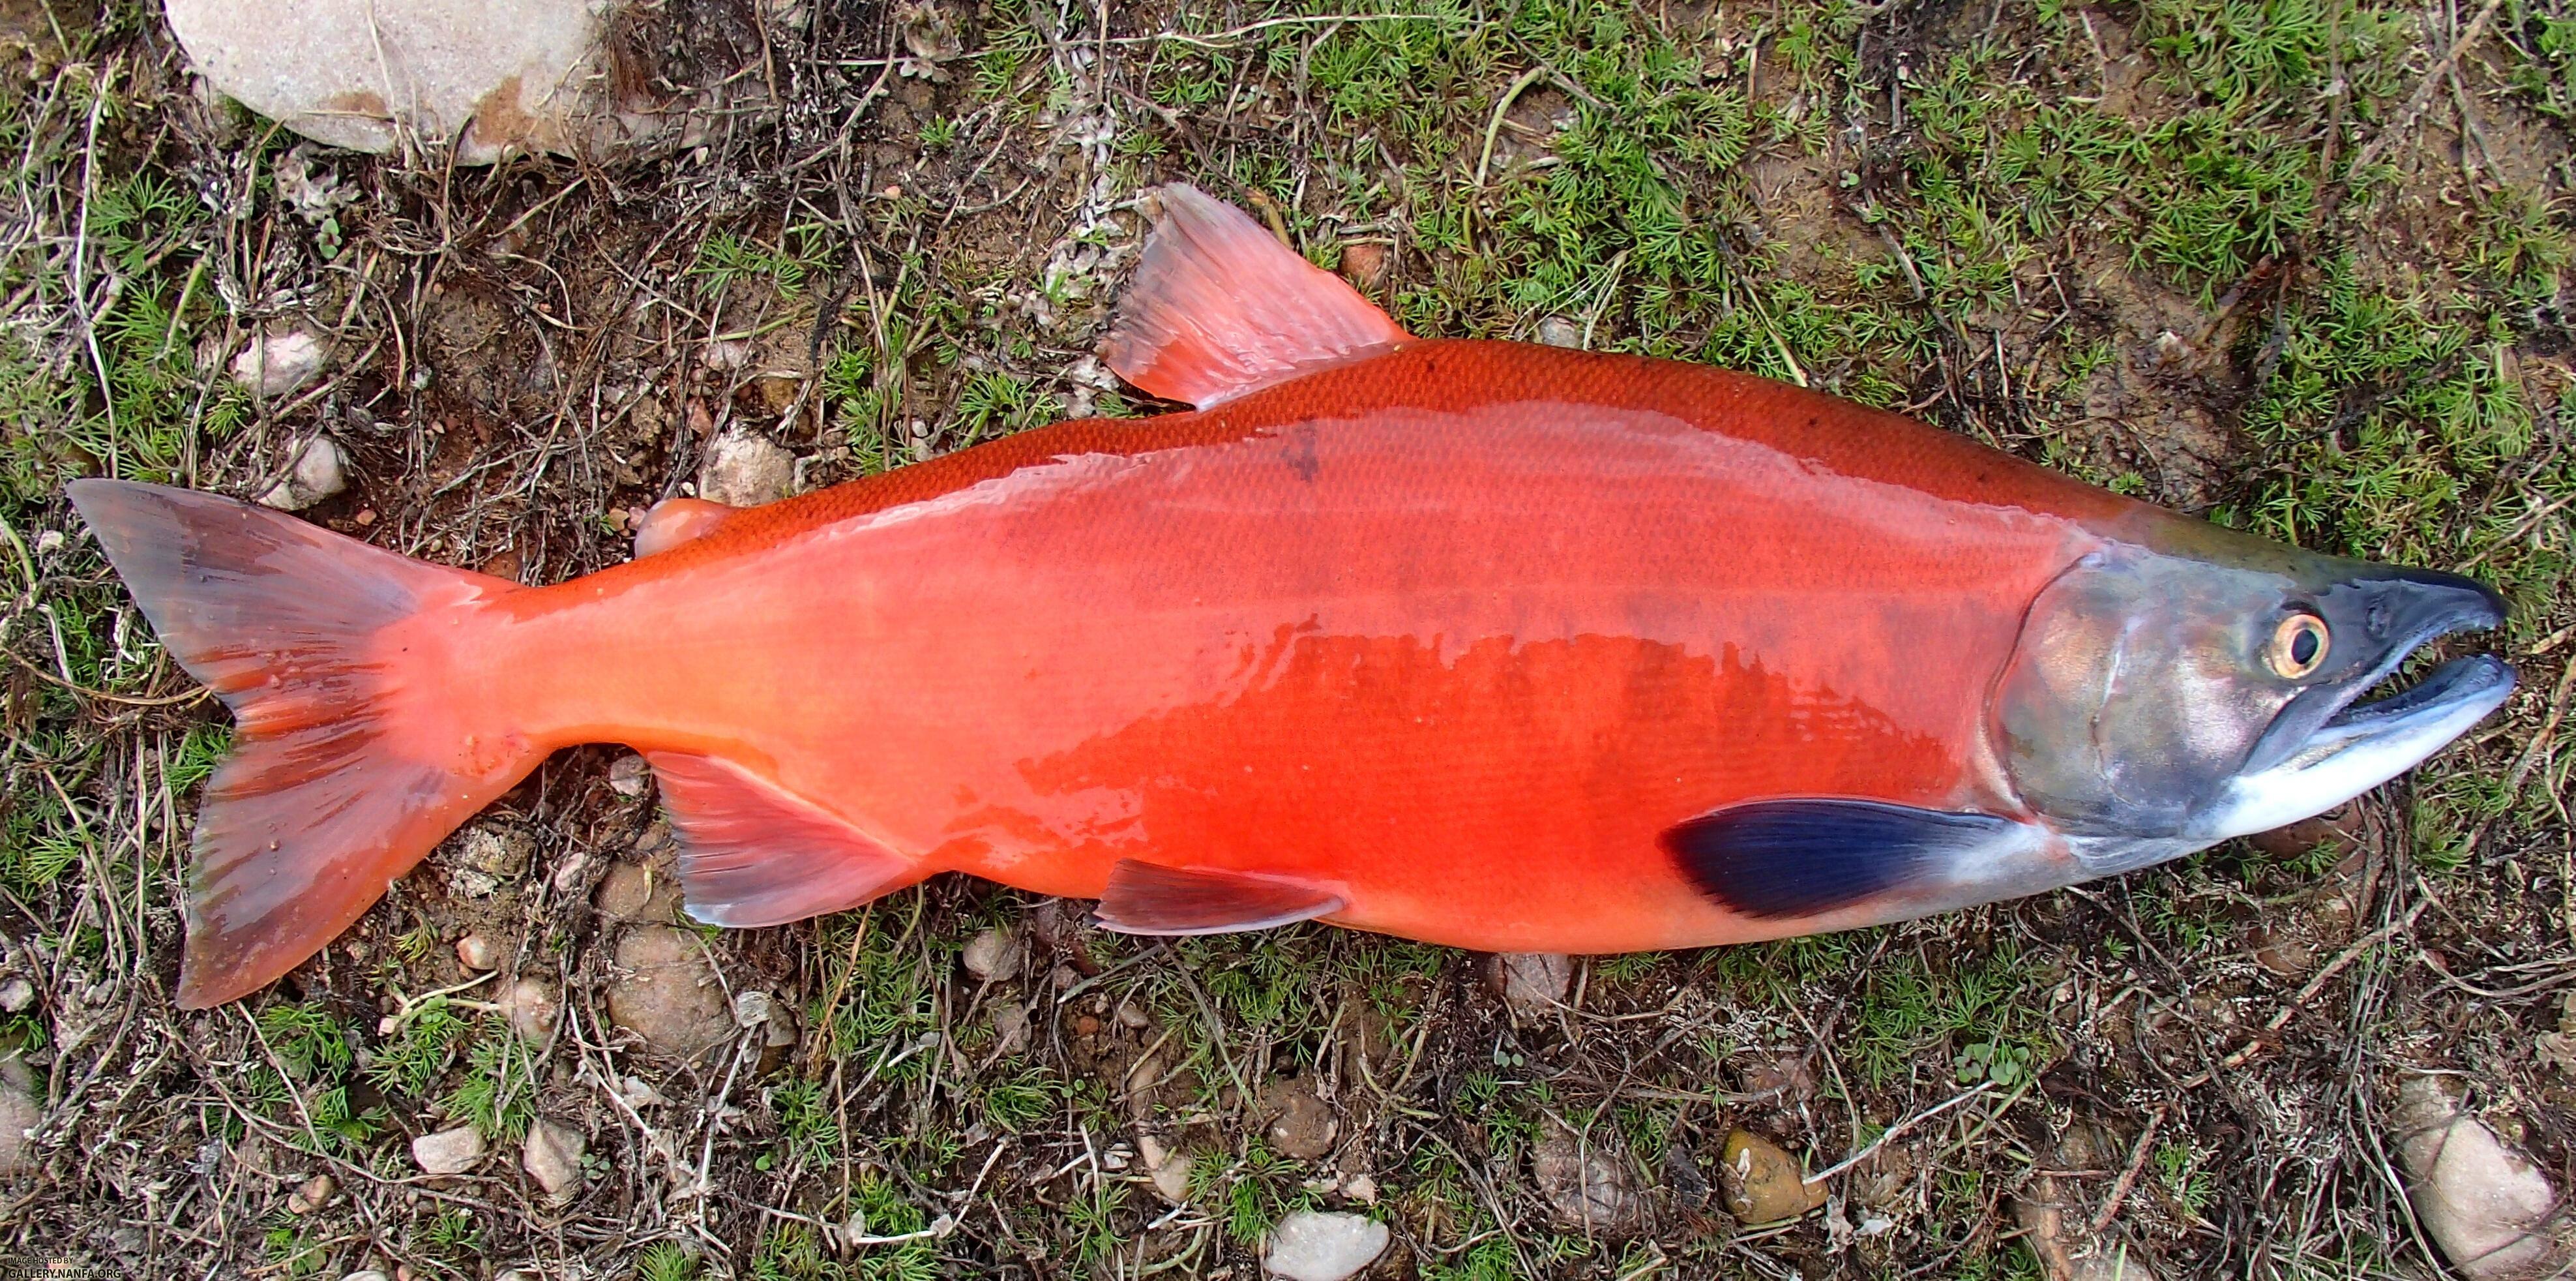 salmon - Google Search | Project 5 | Pinterest | Melanistic animals ...